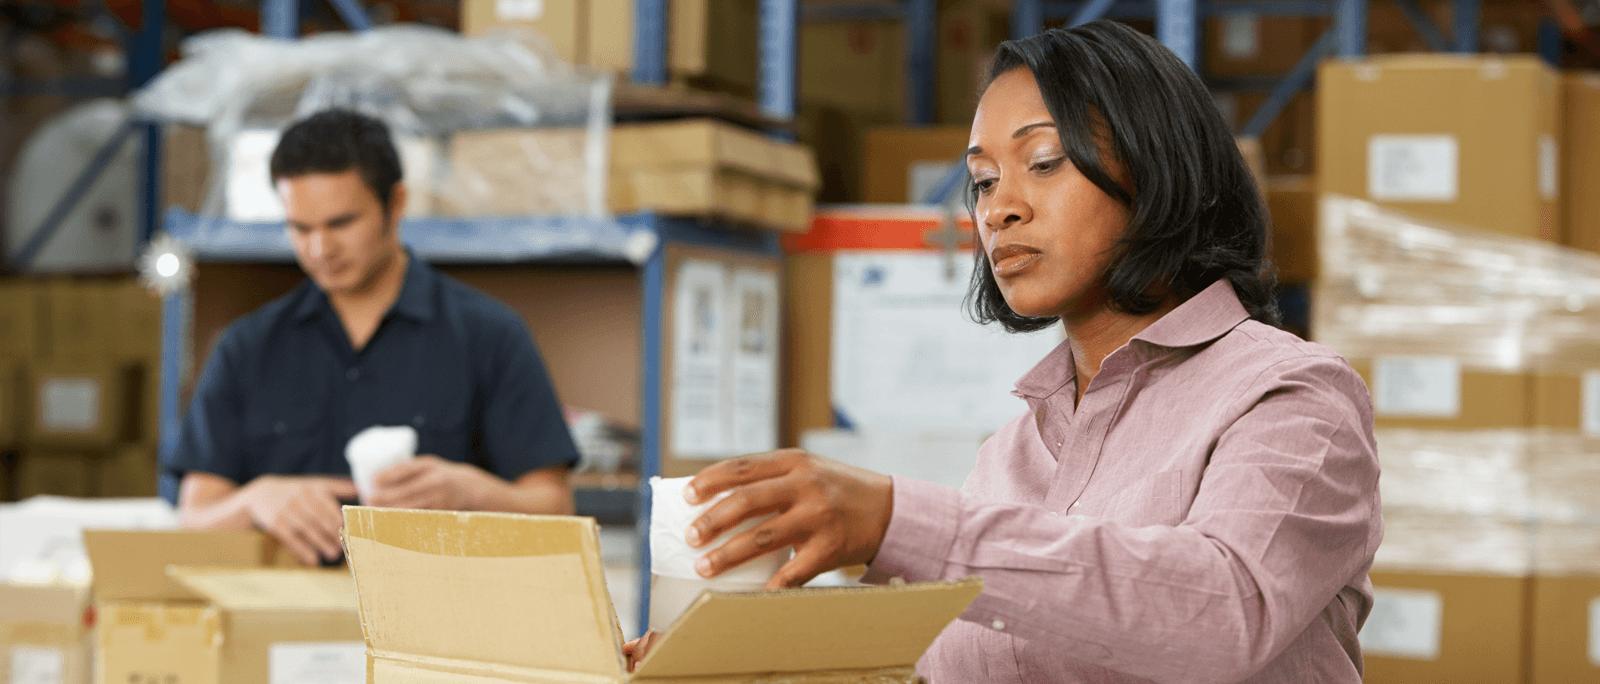 Warehouse Packer Job Description & Requirements